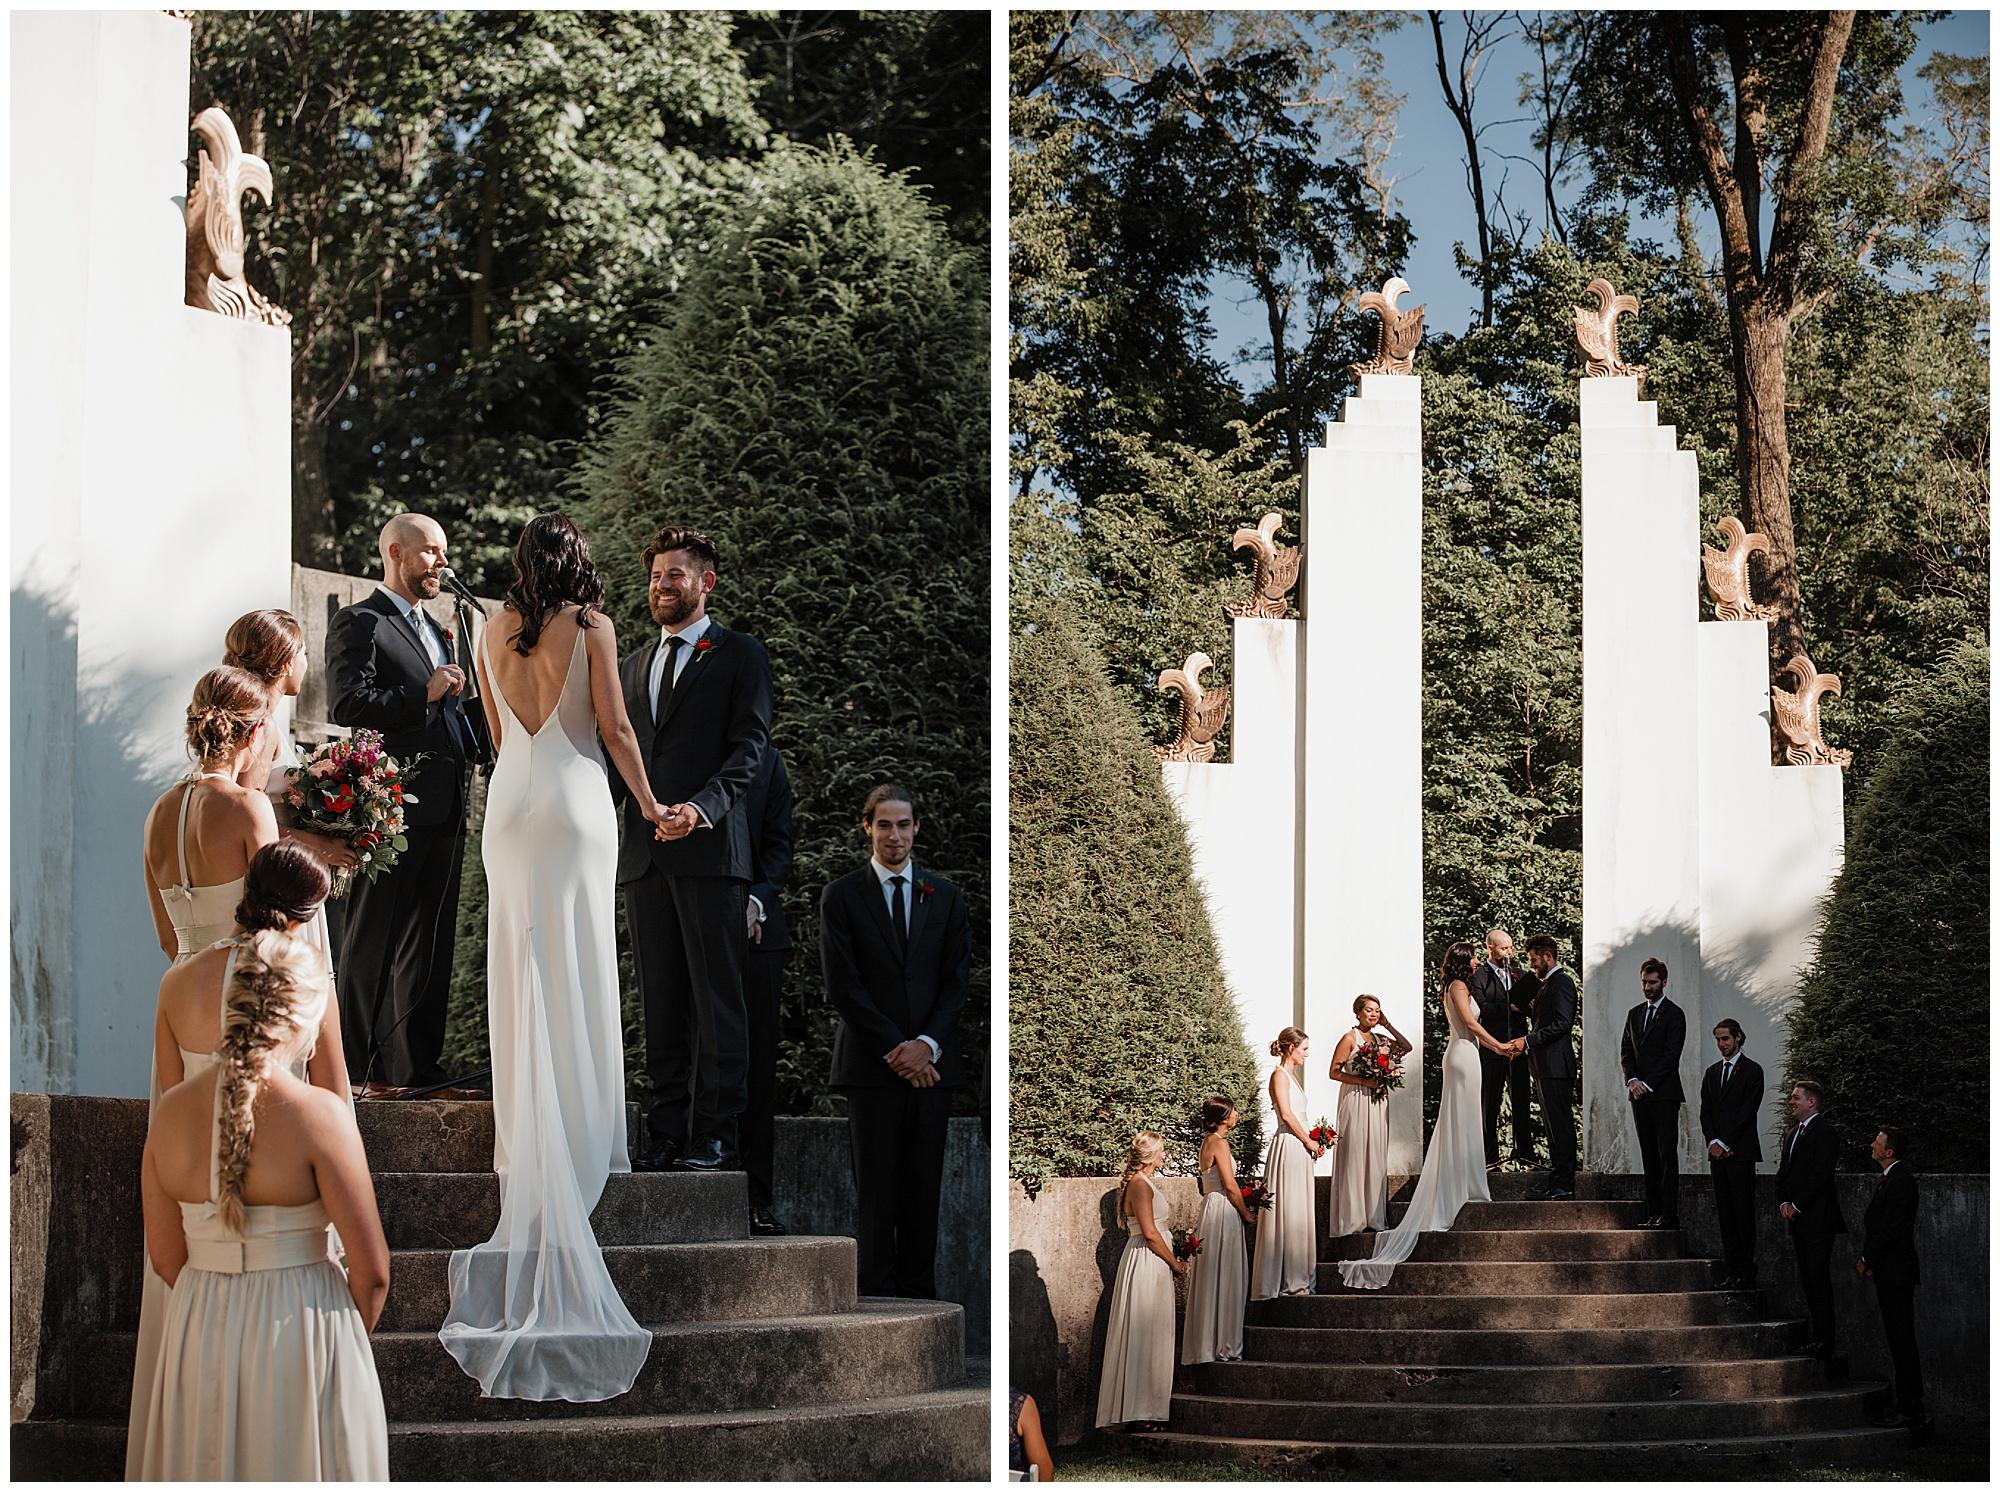 allerton_park_wedding_champaign_il_chicago_wright_photographs_ne_0030.jpg